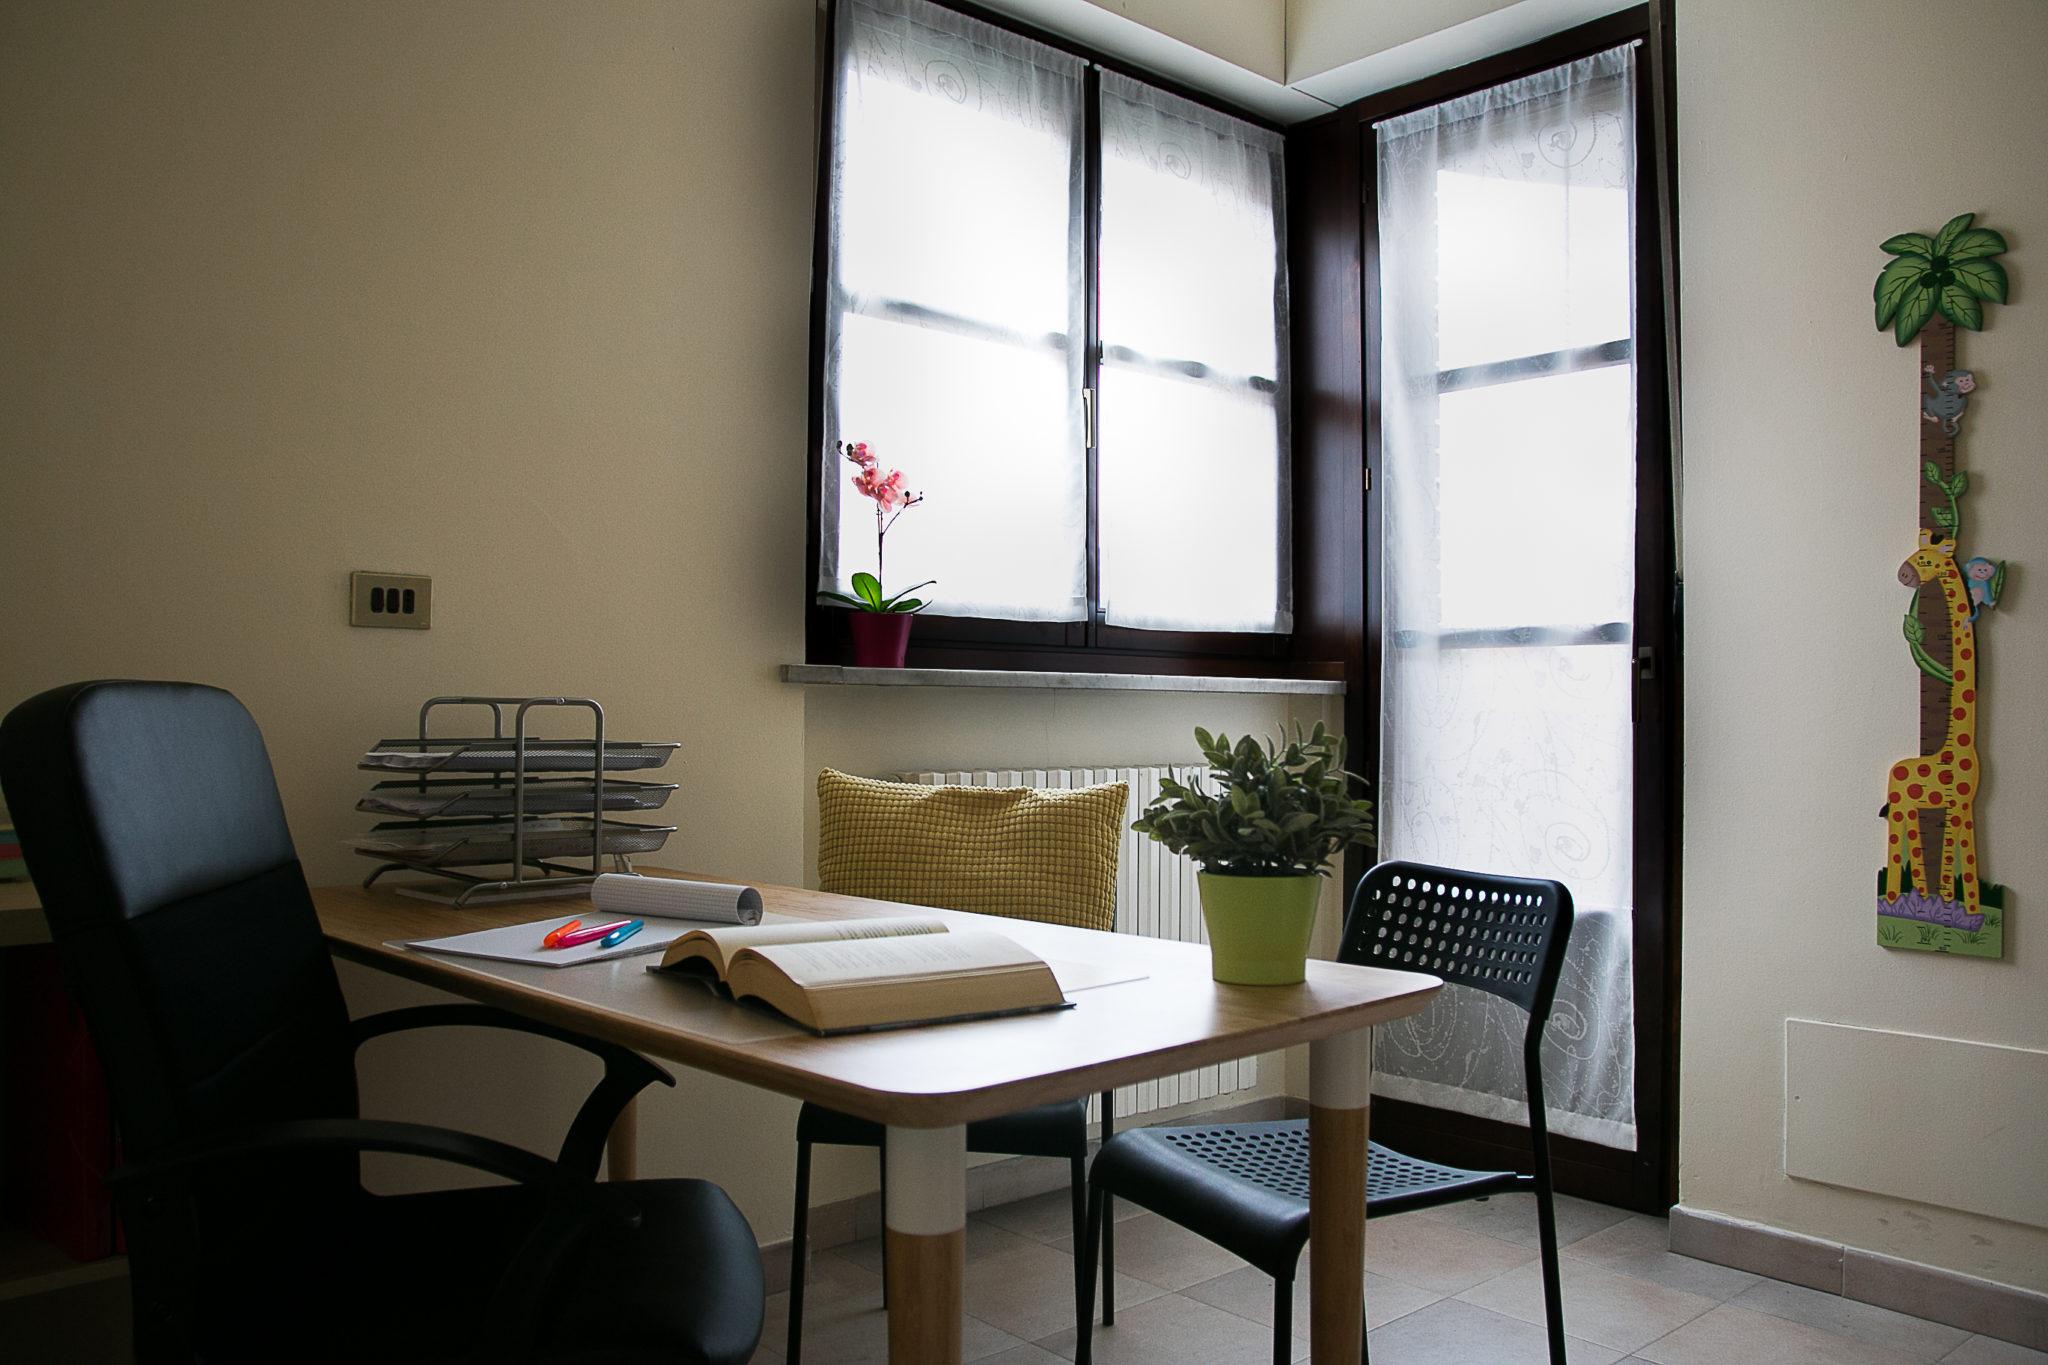 Homeonstage fotografia interni studio torino 1 home on stage for Studio architettura interni torino